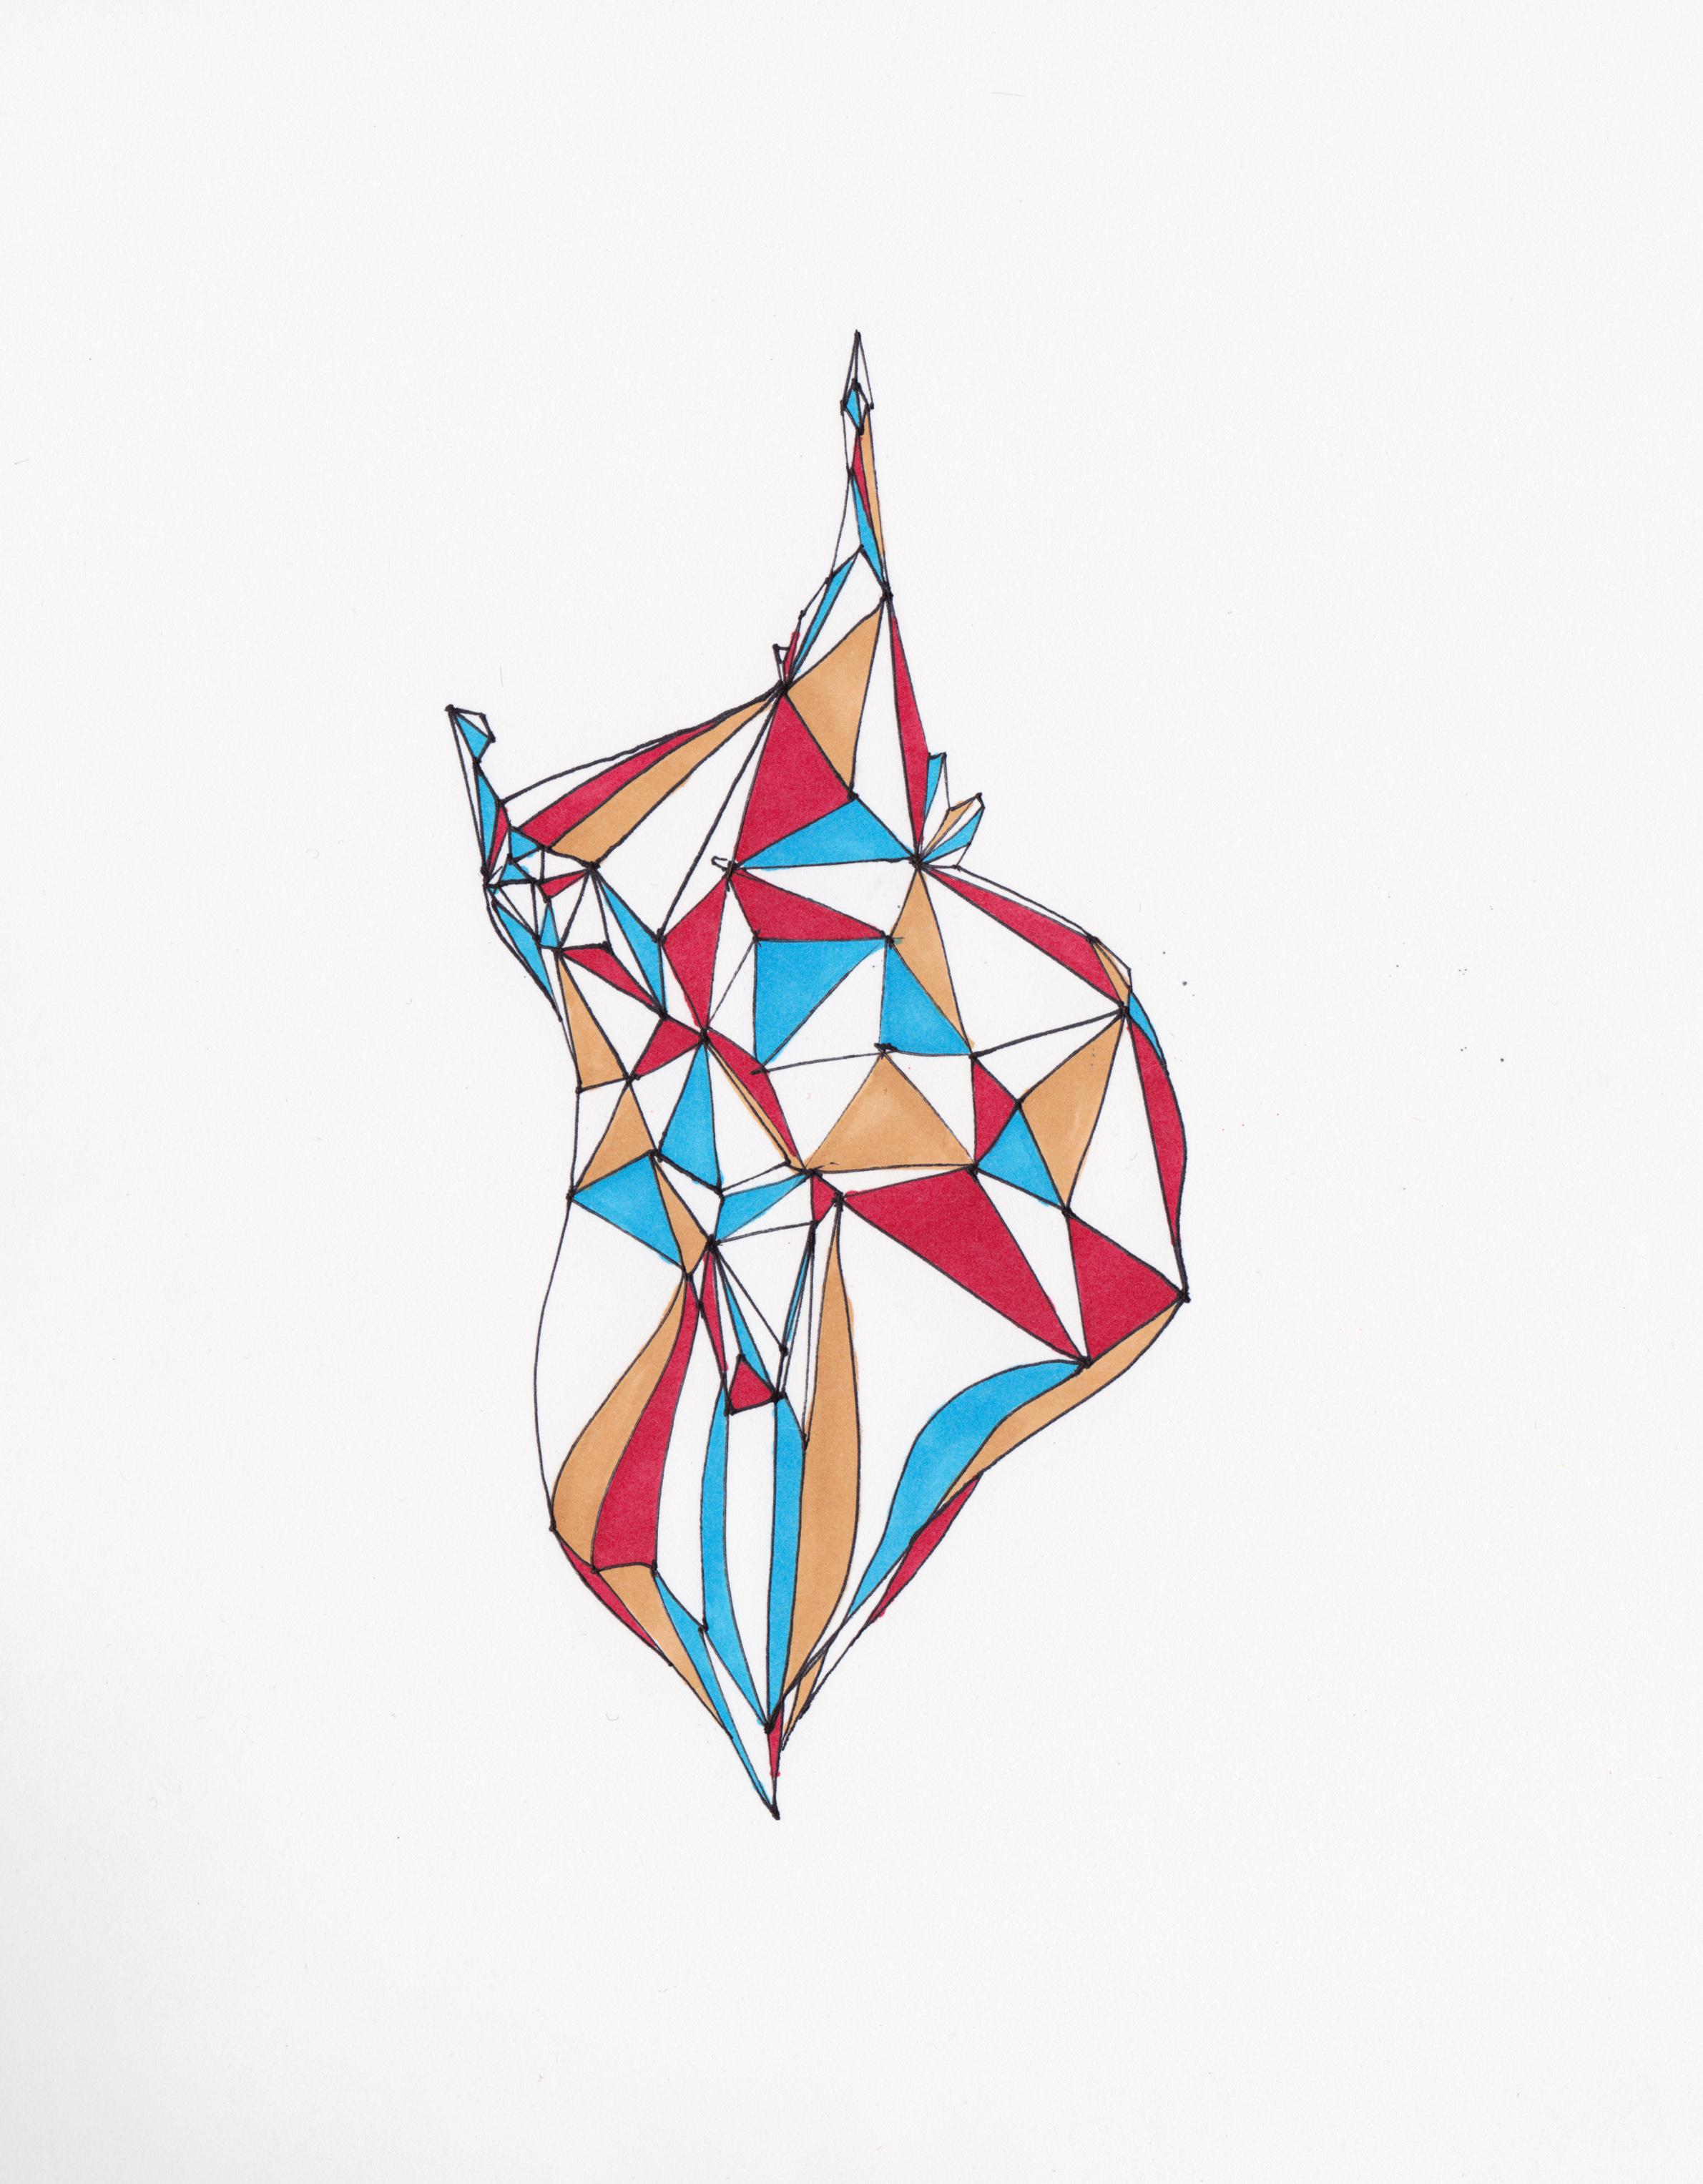 JEREMY RUMAS ART + PEN and MARKER SKETCHES 04 + abstract futurism + modern art +www.jeremyrumas.com.jpeg